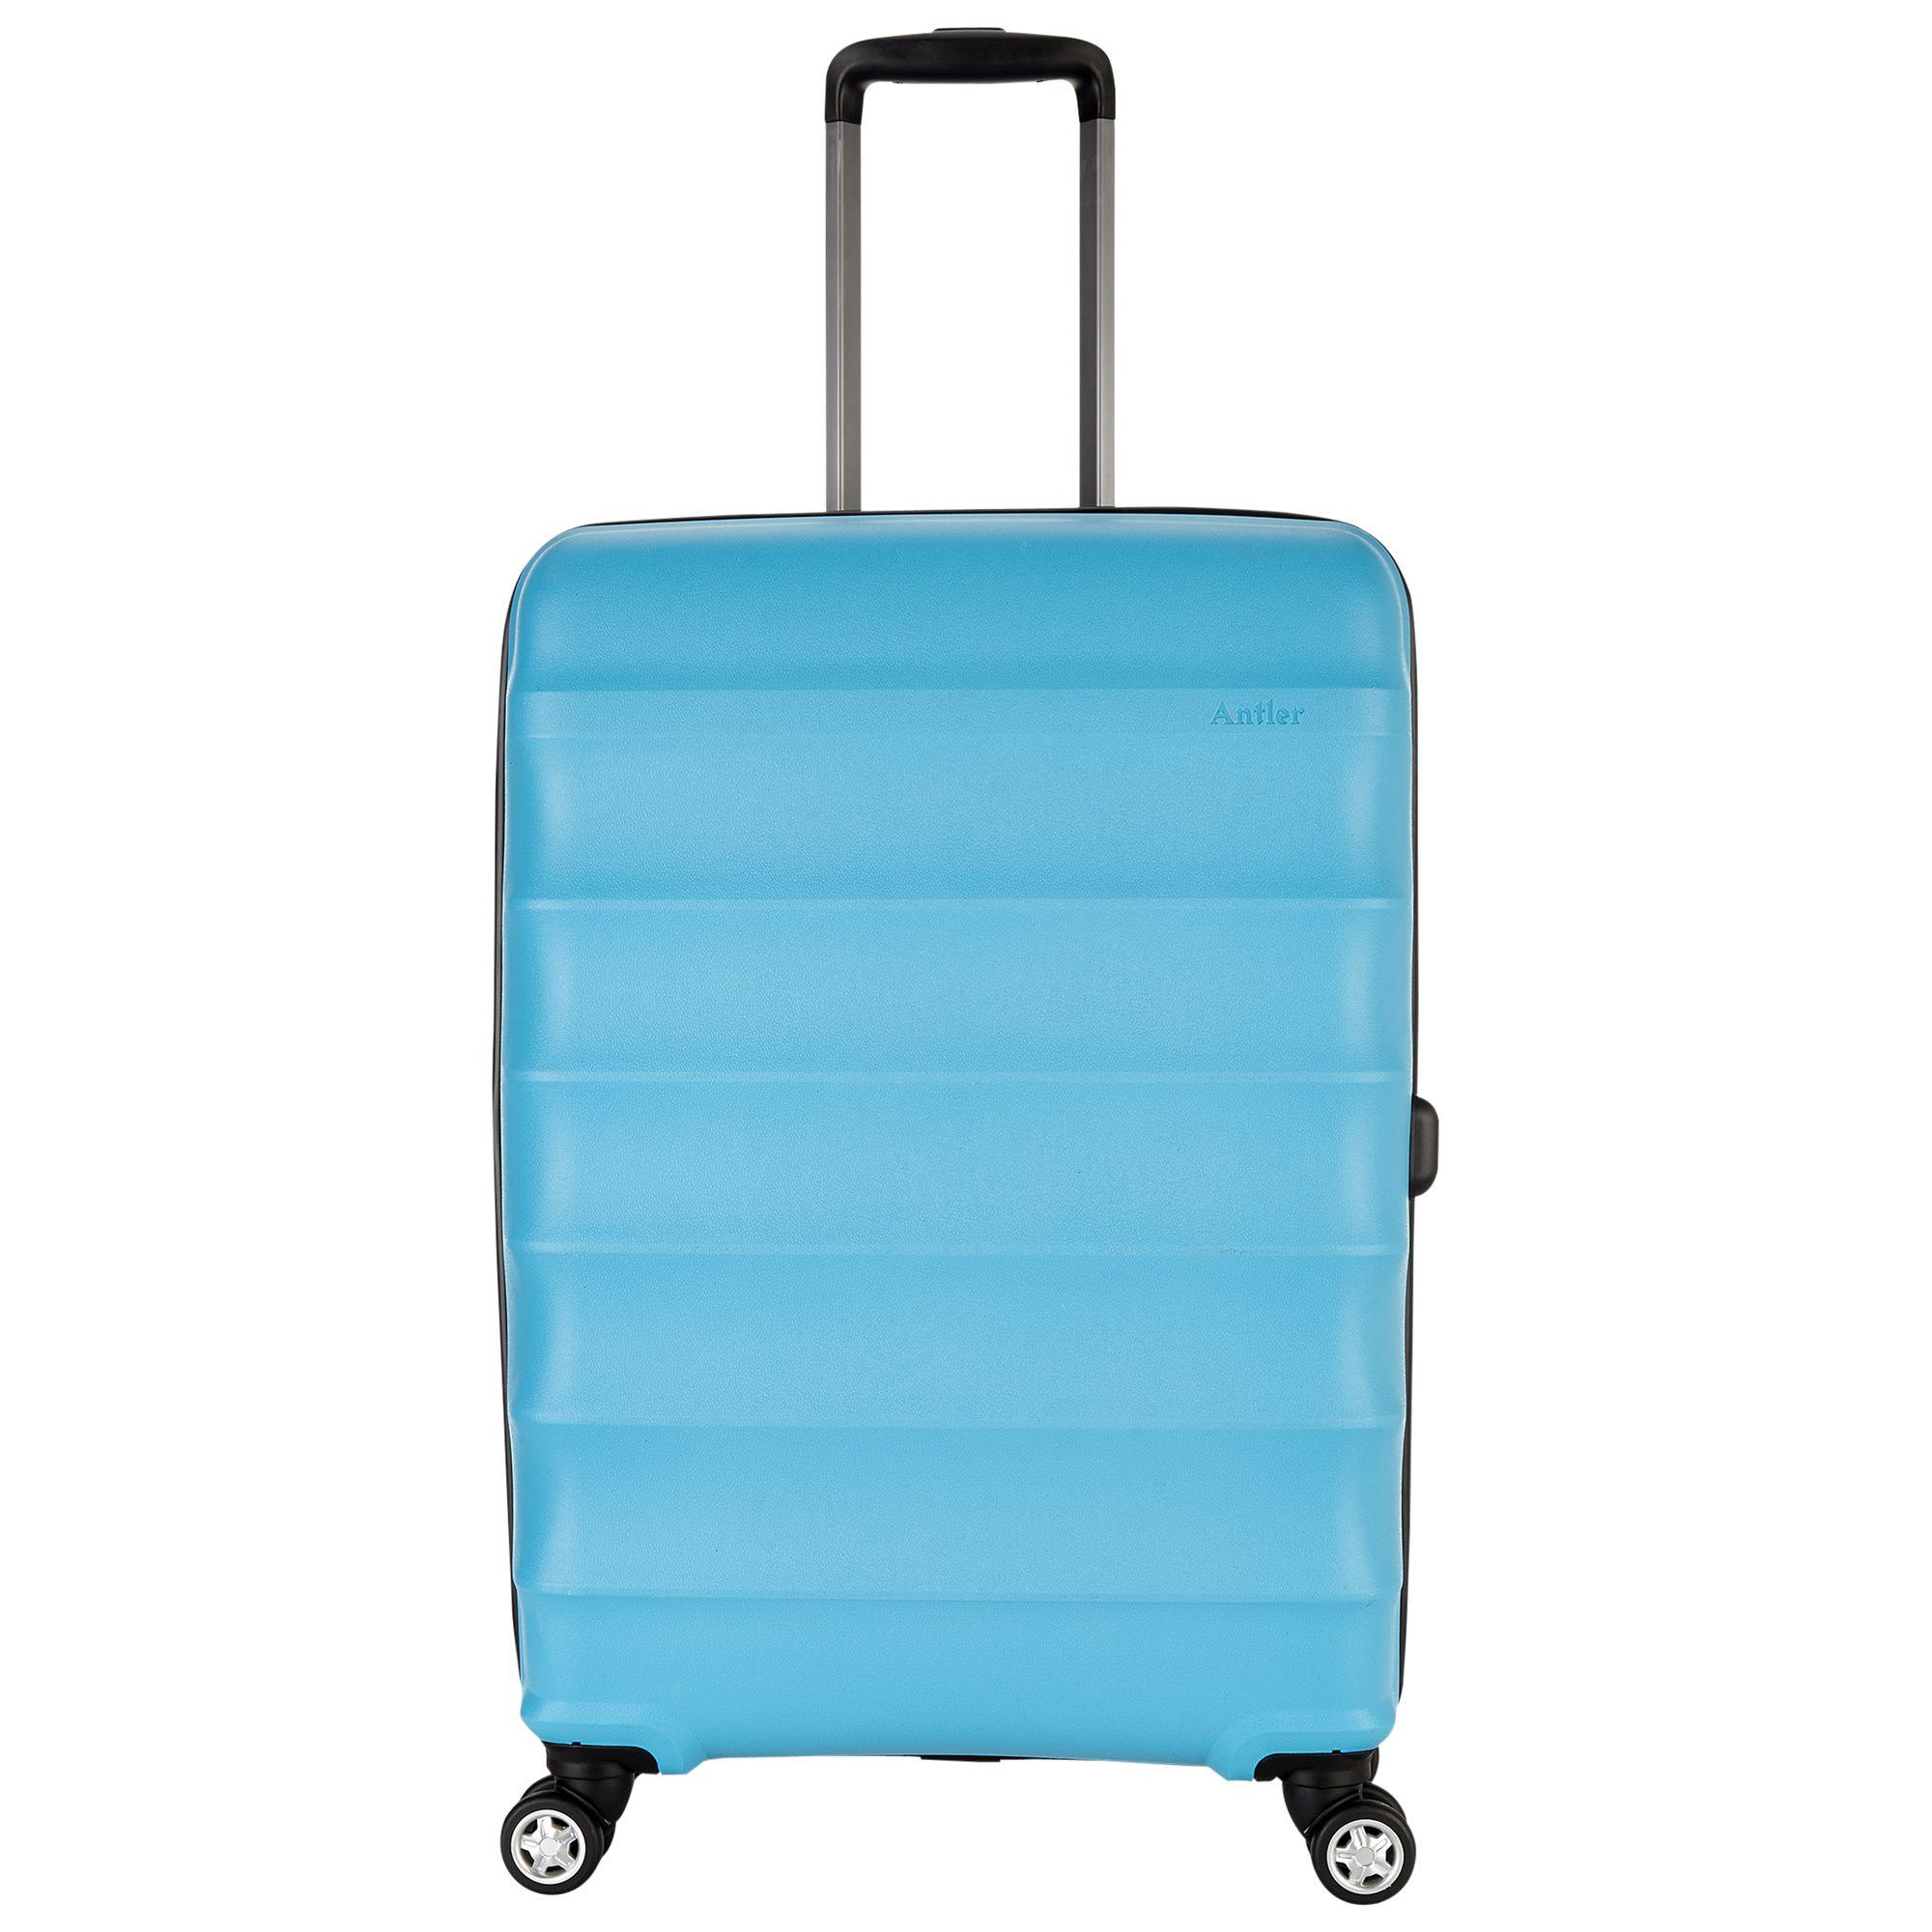 Antler Antler Juno 4-Wheel 68cm Medium Suitcase